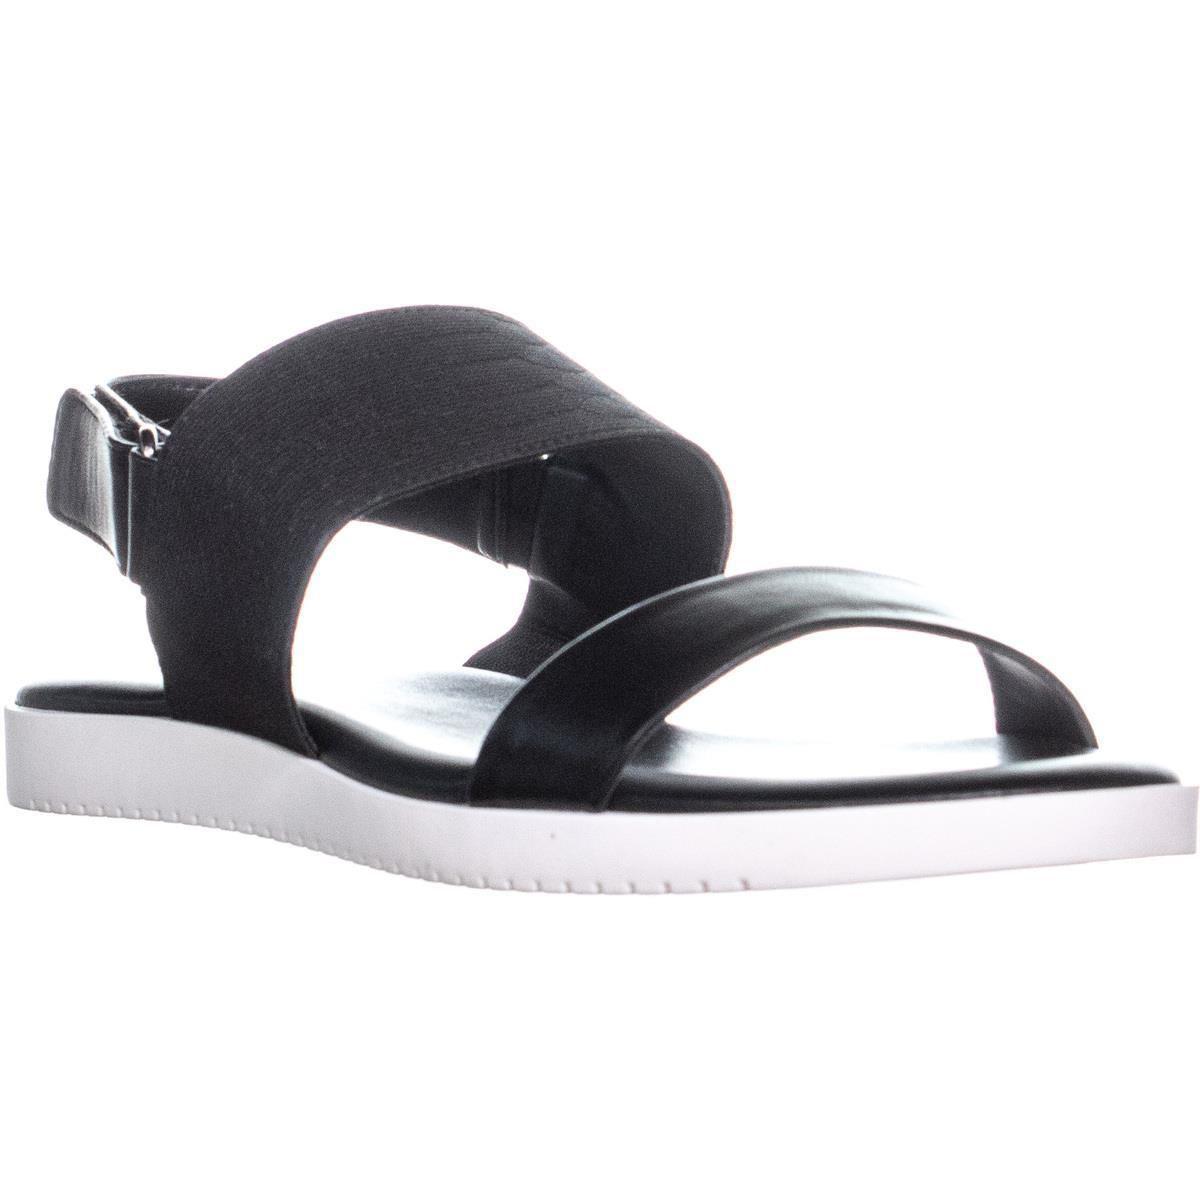 0b577384bfd Lyst - Alfani A35 Shaee Large Strap Slingback Flat Sandals